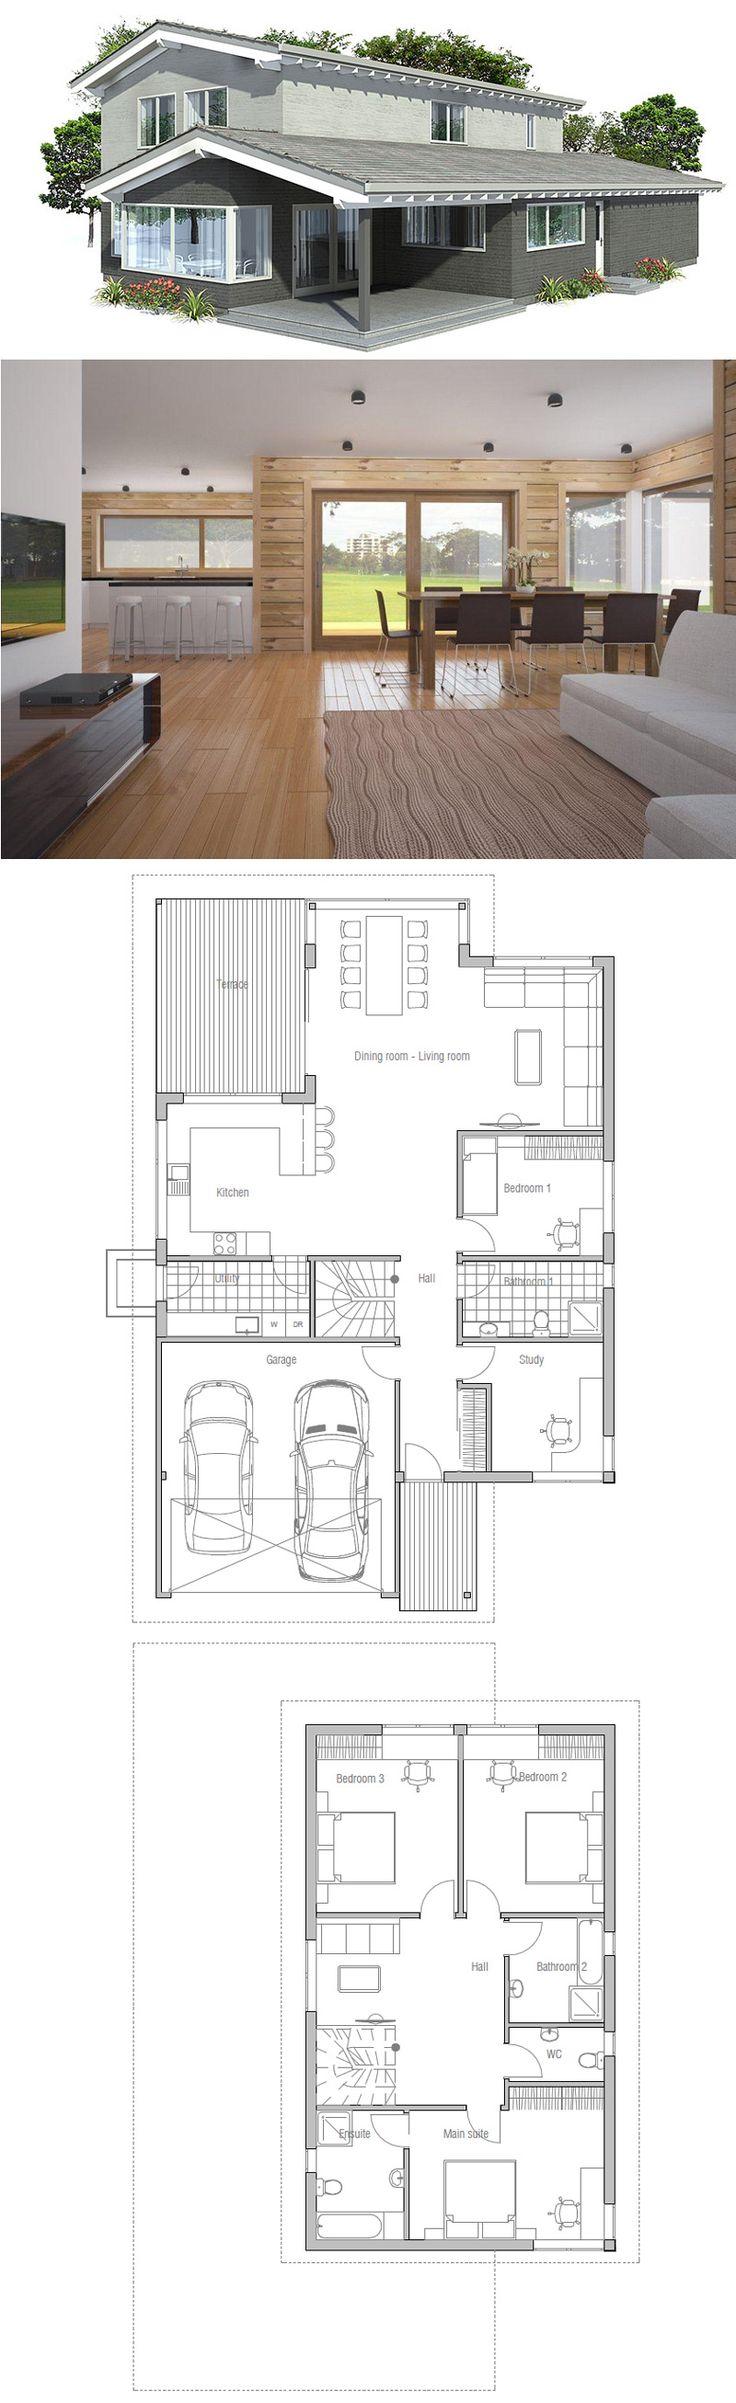 Modern Four Bedroom House Plans 17 Best Images About Narrow House Plans On Pinterest House Plans